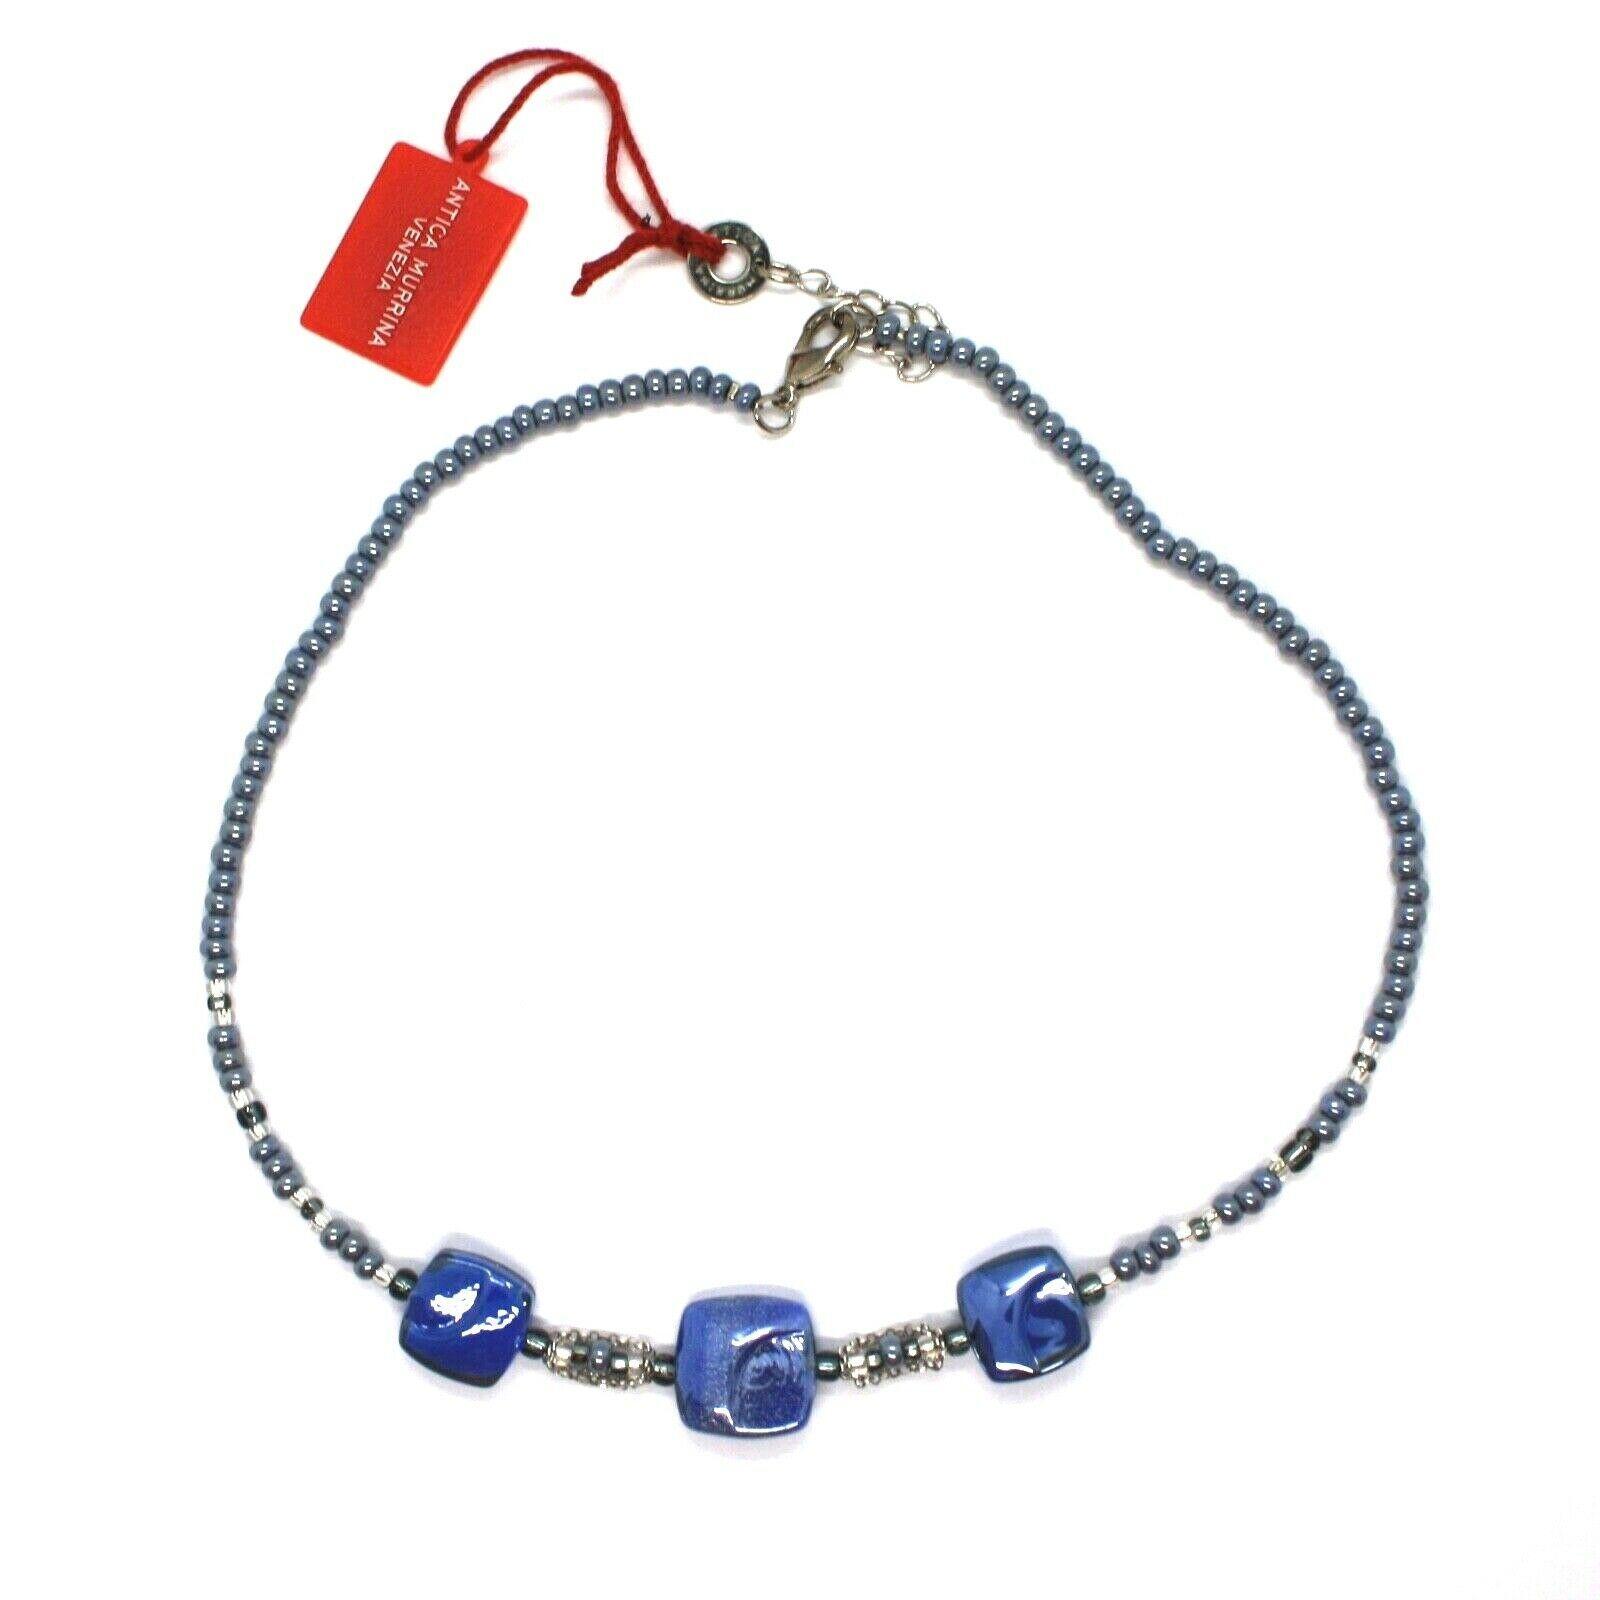 Necklace Antique Murrina Corner CO990A06 with Murano Glass Blue Choker